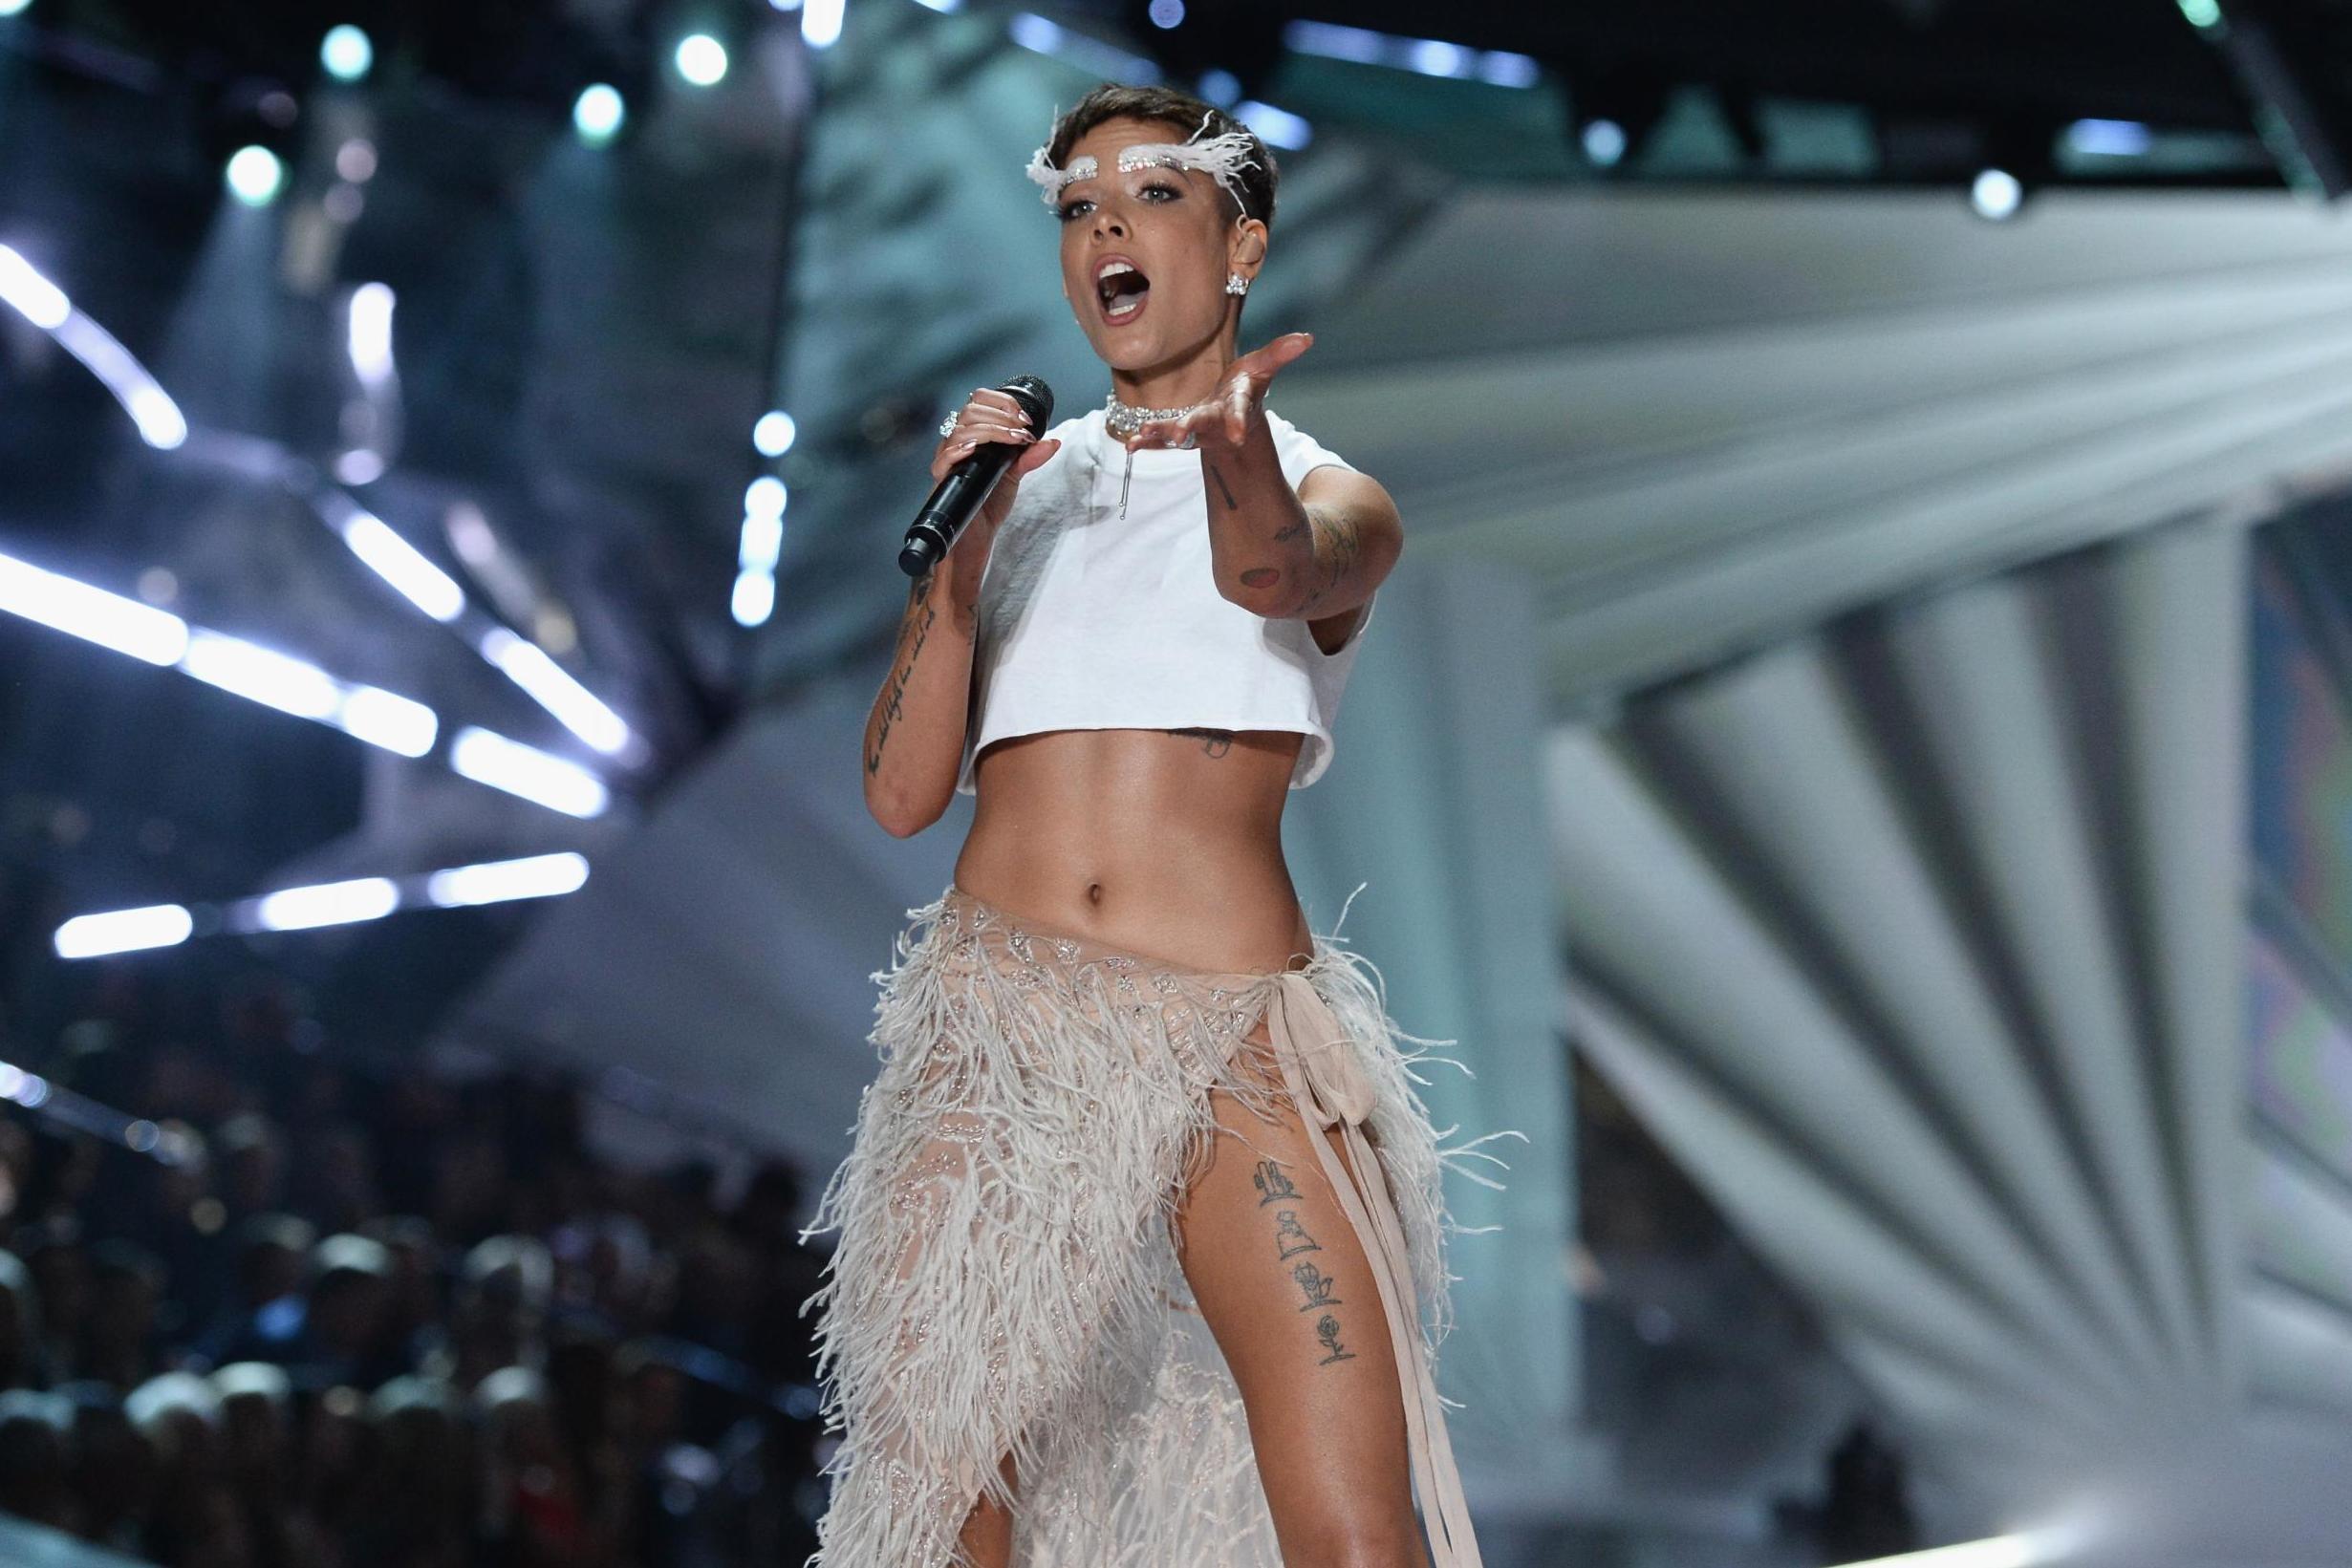 Halsey review, Manic: Popstar wrestles with self-destructive tendencies on her erratic third album